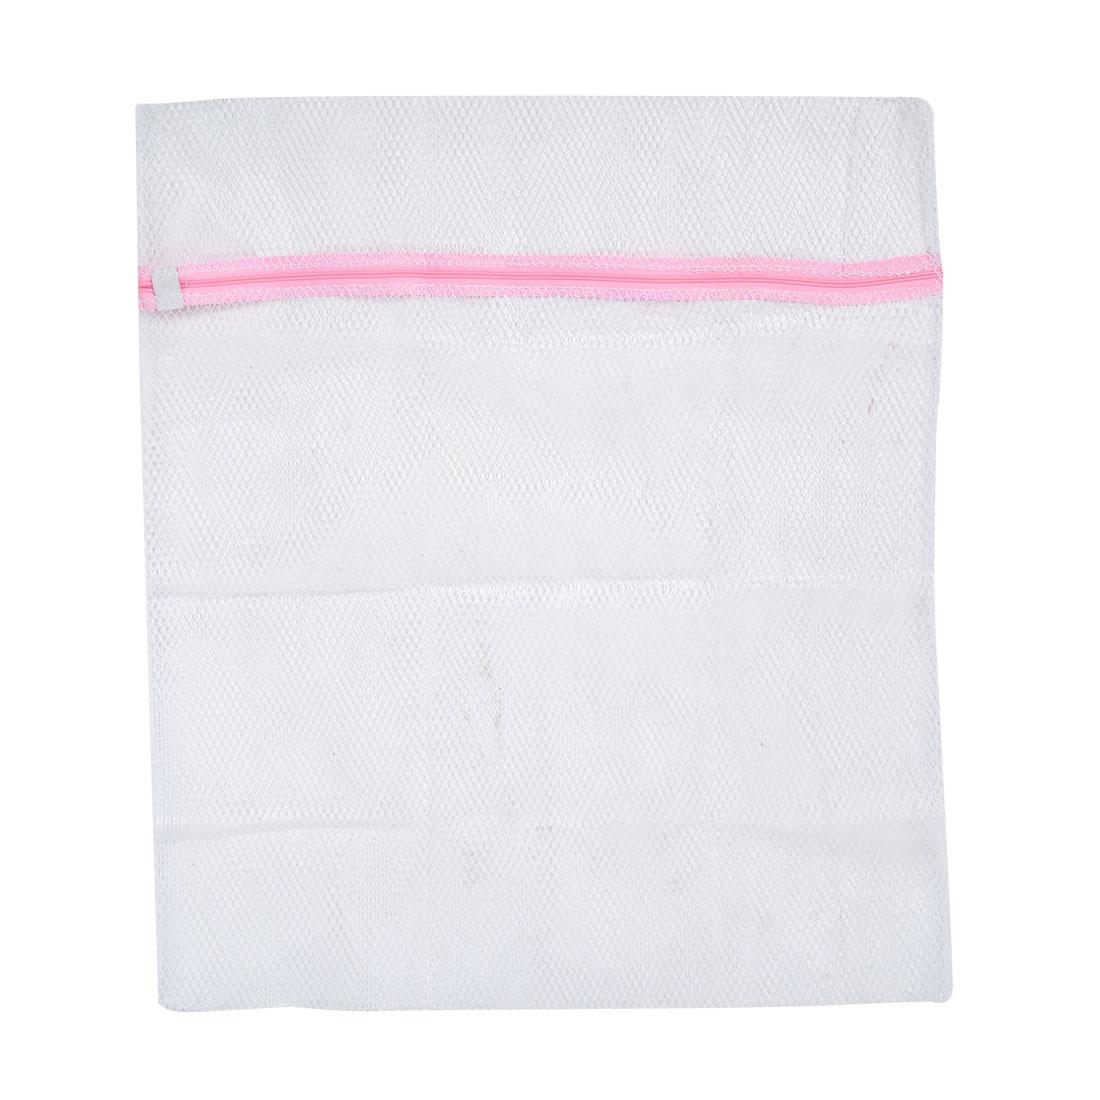 Laundry 58cm x 48cm White Coast Clothes Zipper Nylon Mesh Washing Bag